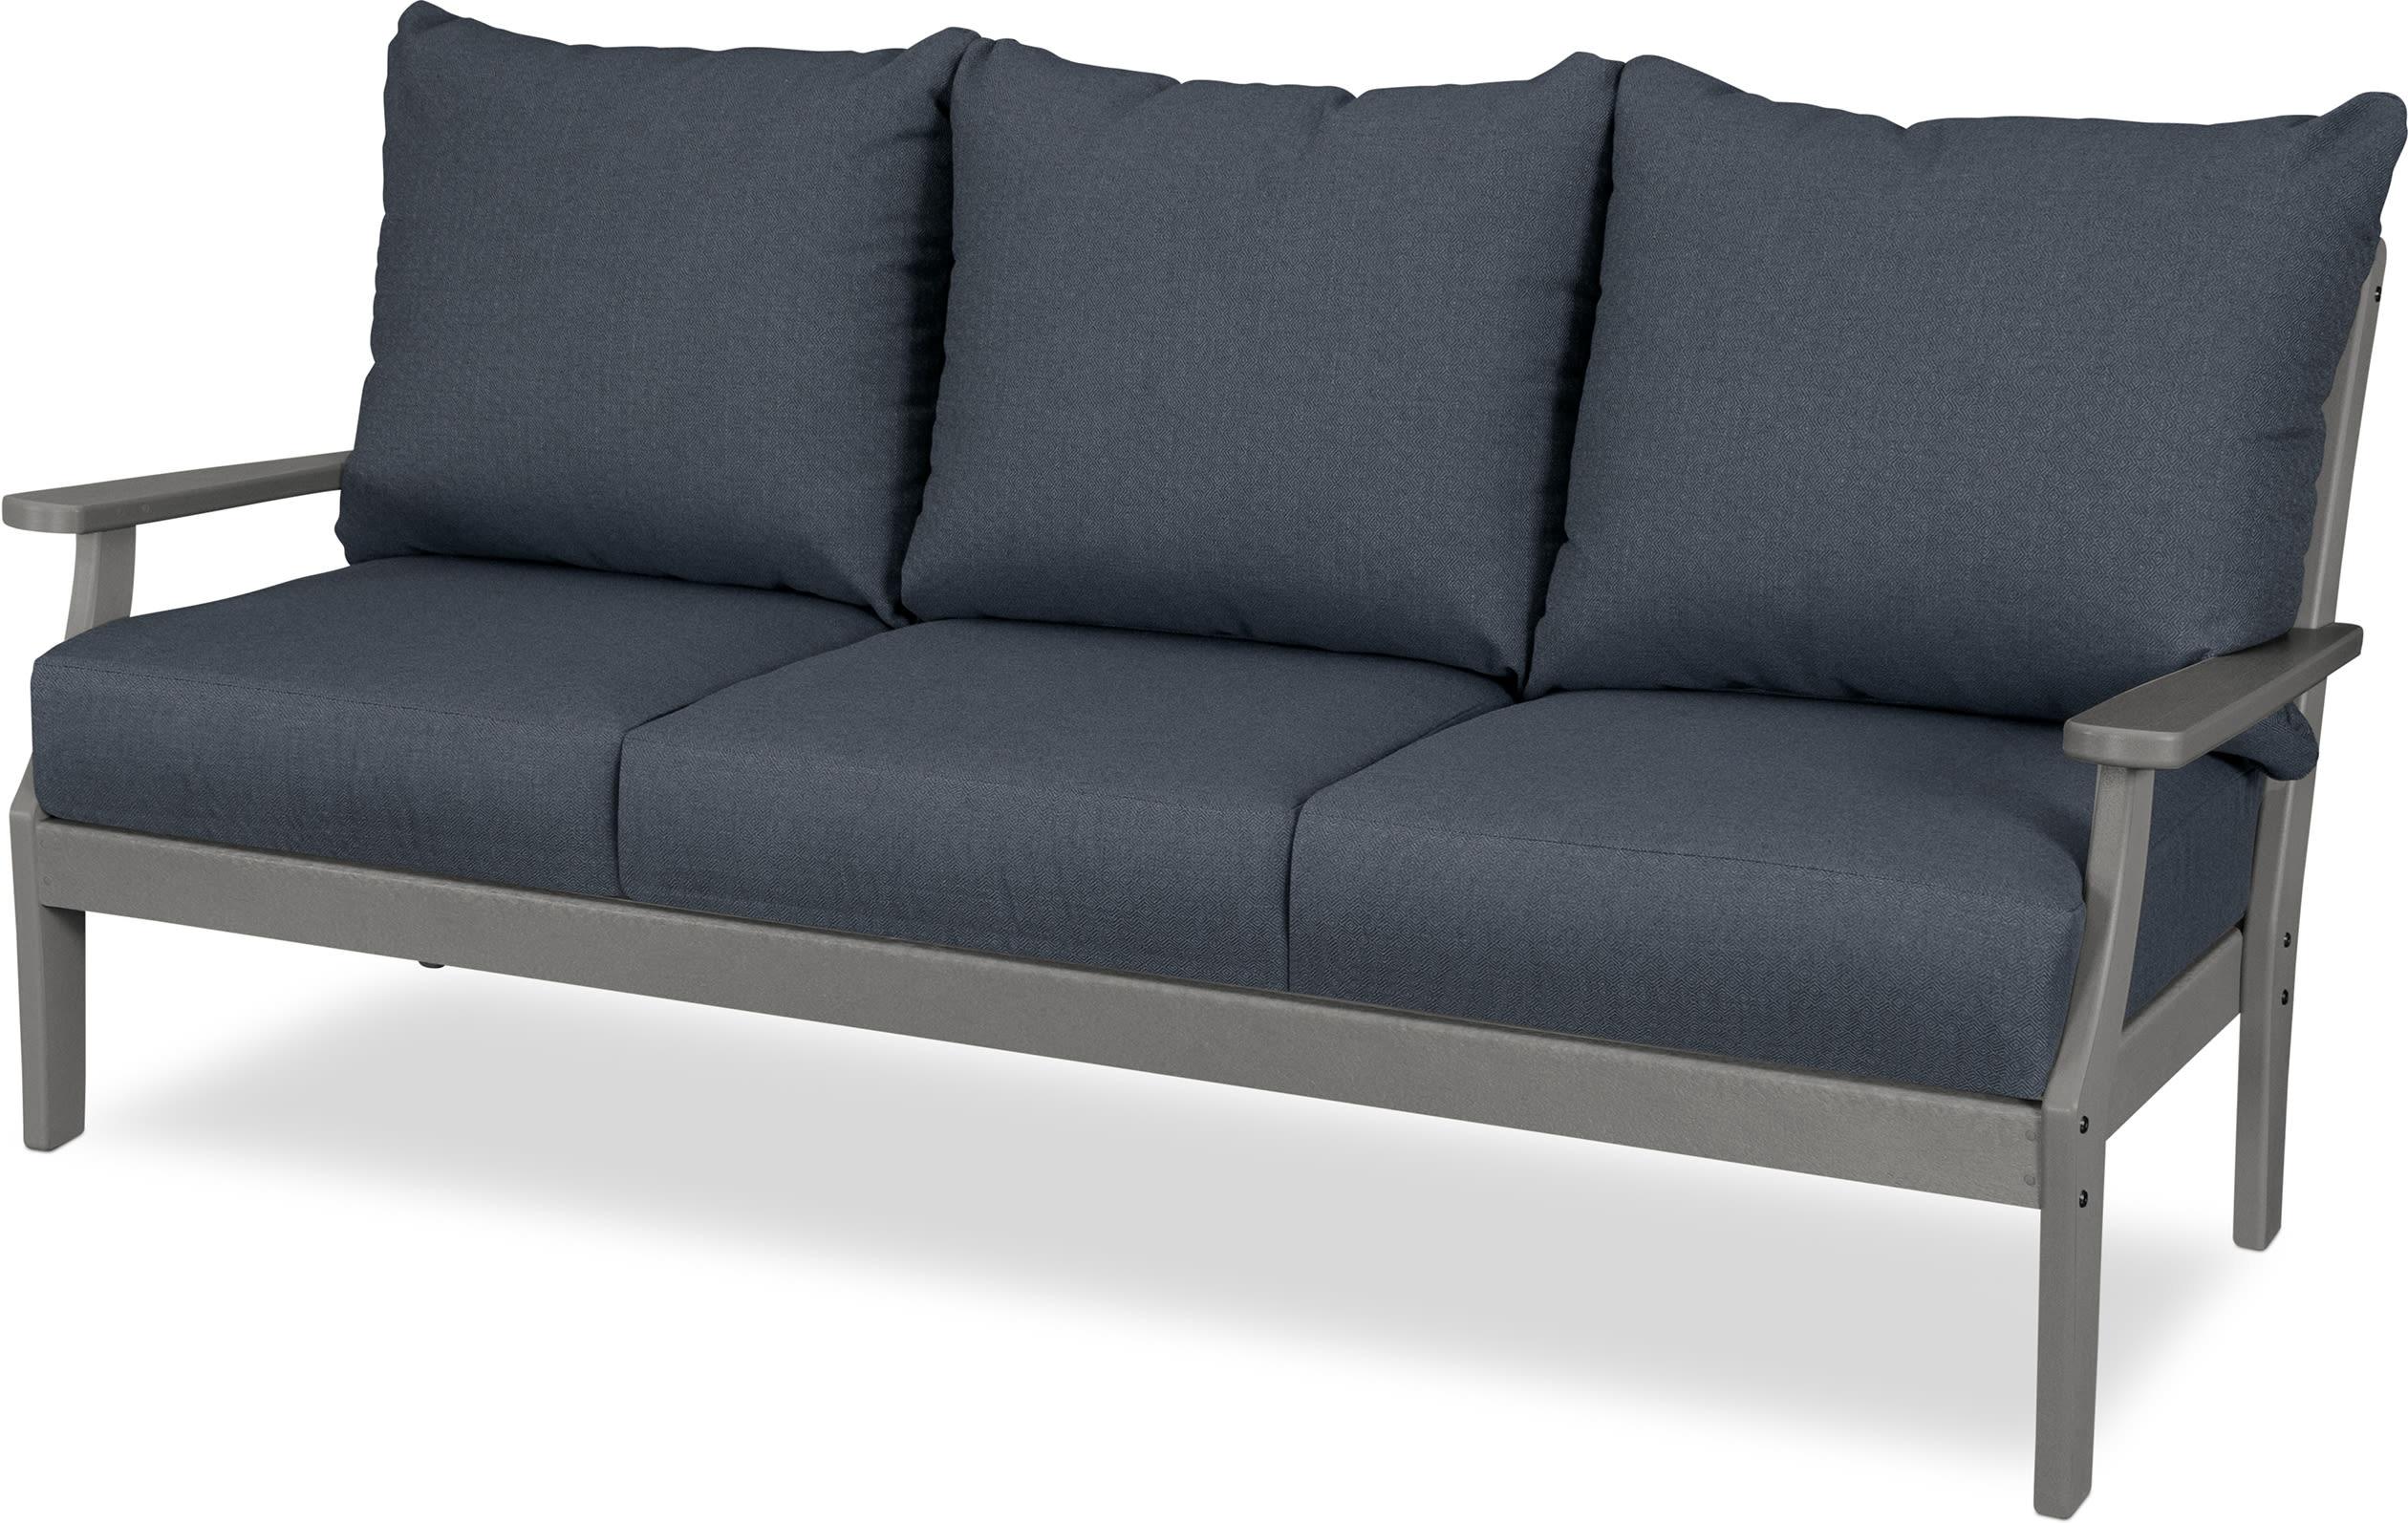 Braxton Deep Seating Sofa